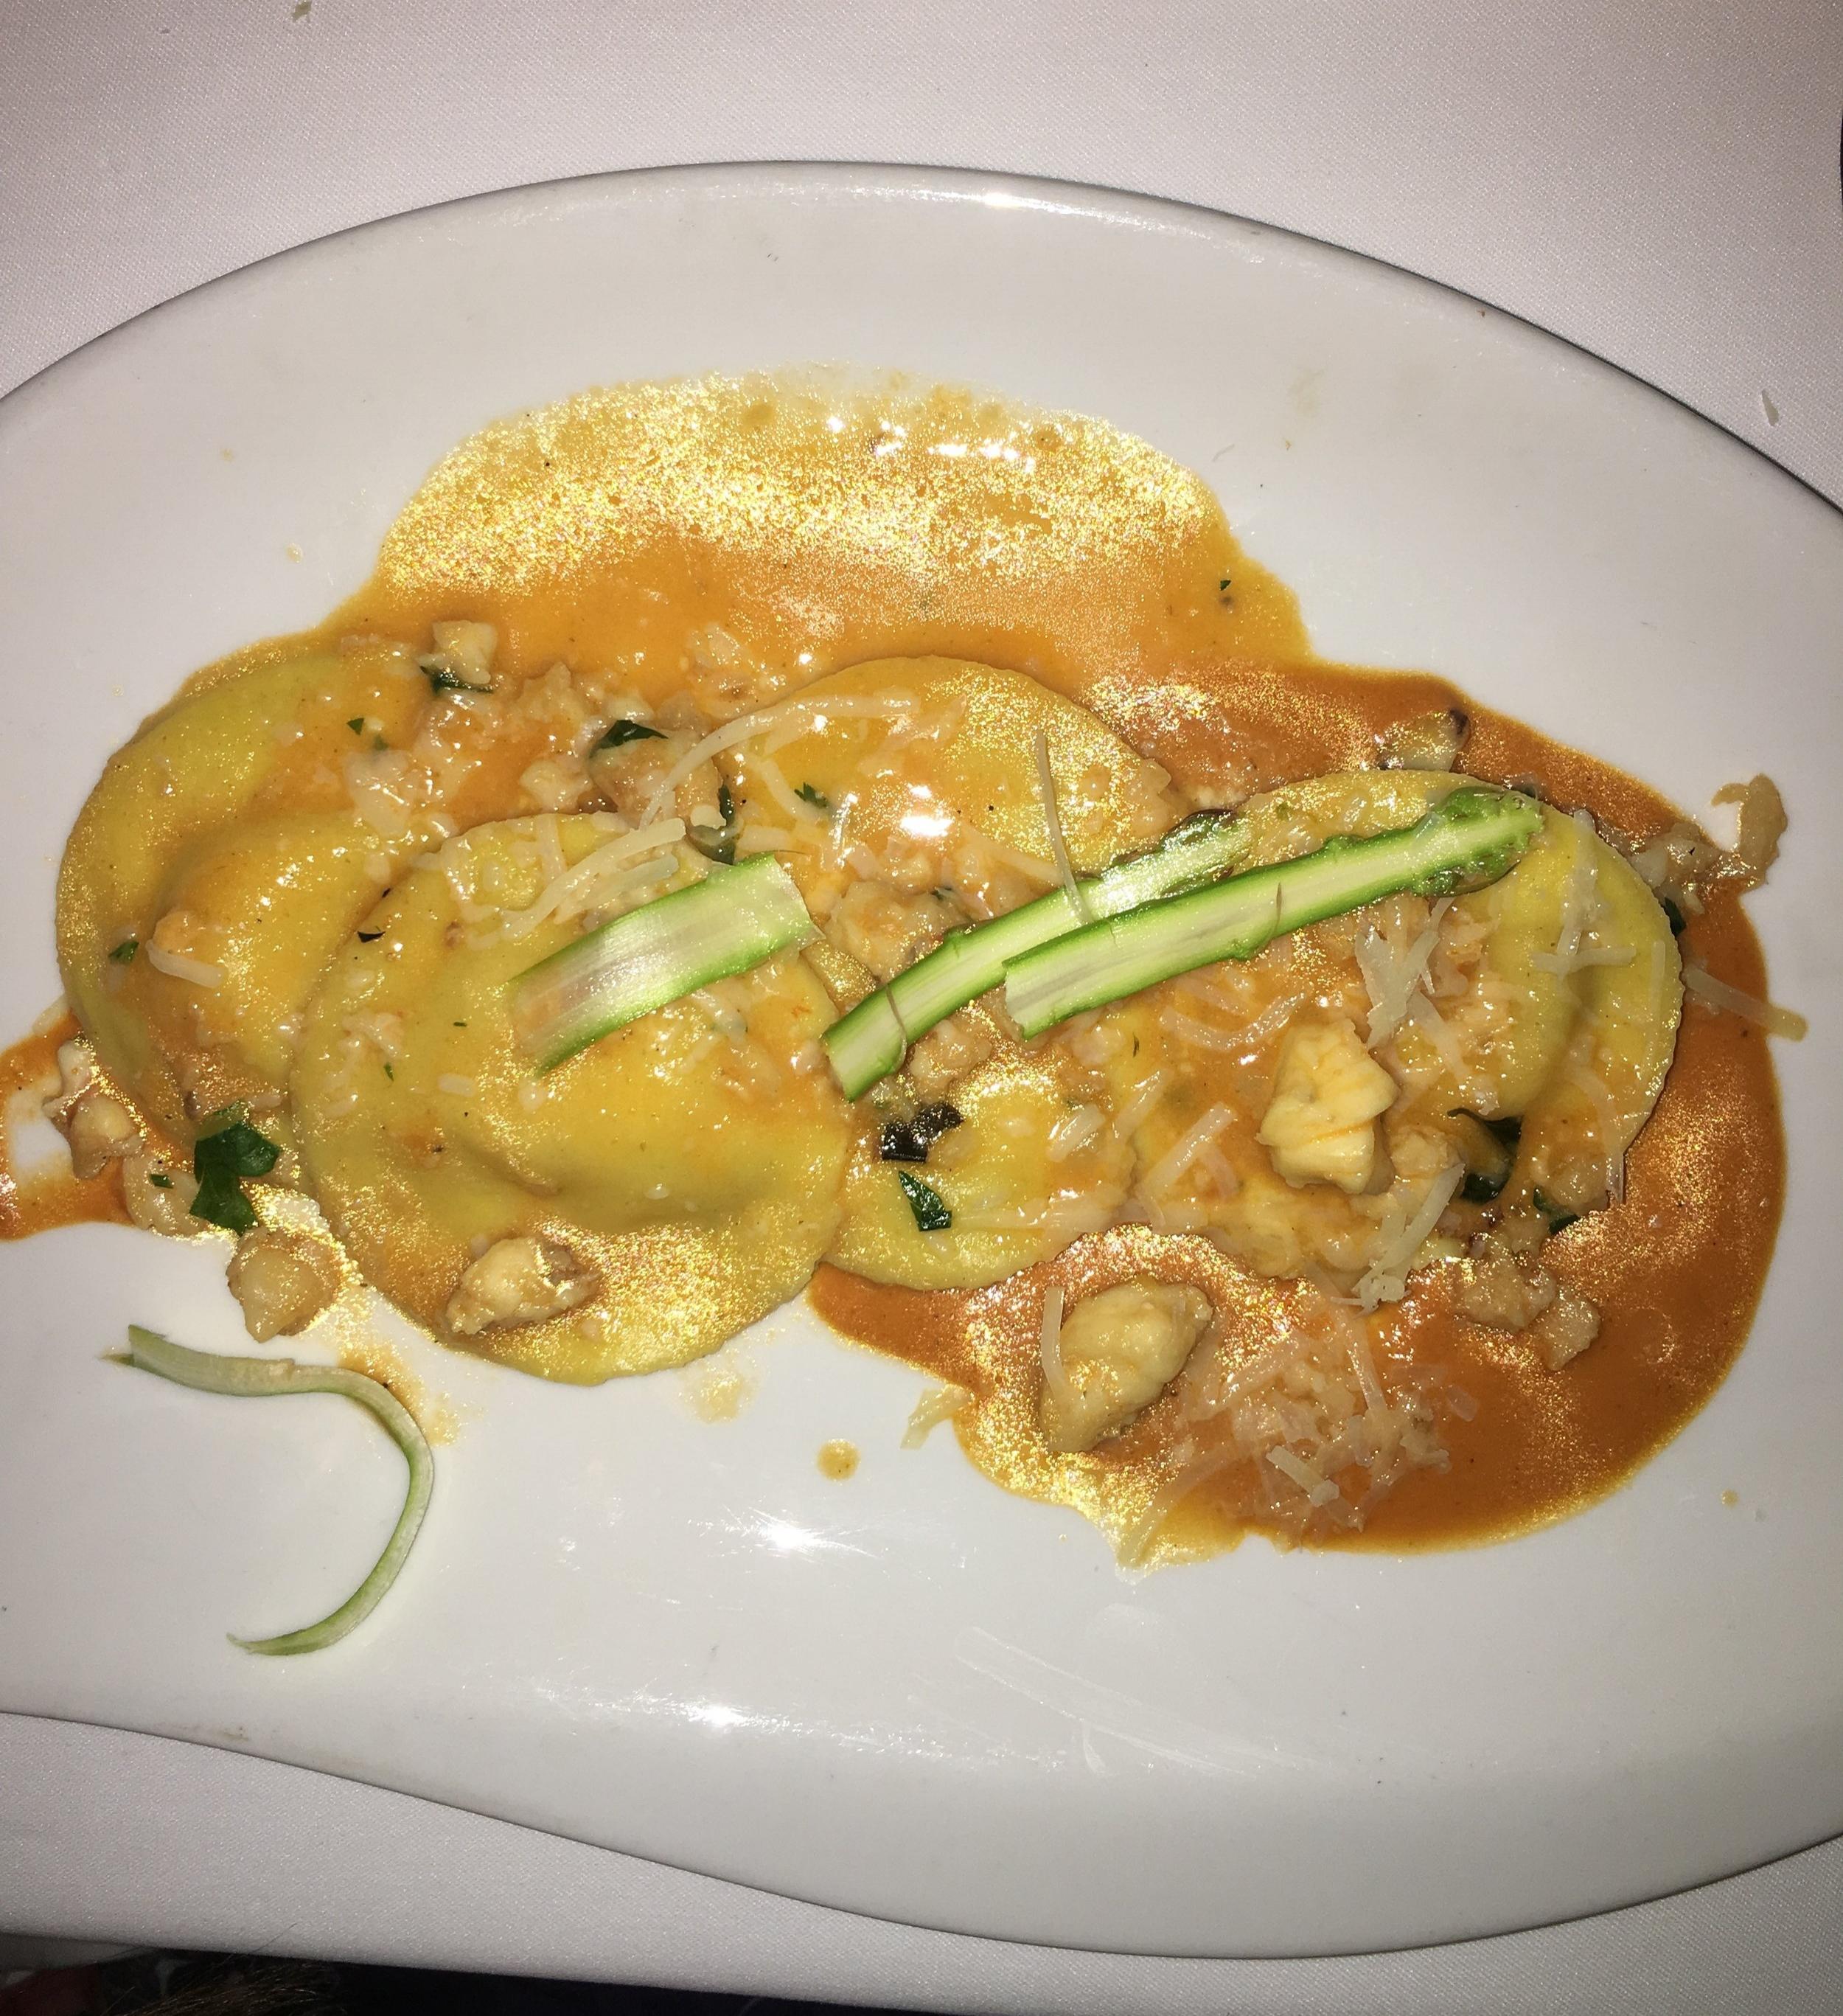 Lobster & Cheese Stuffed Ravioli